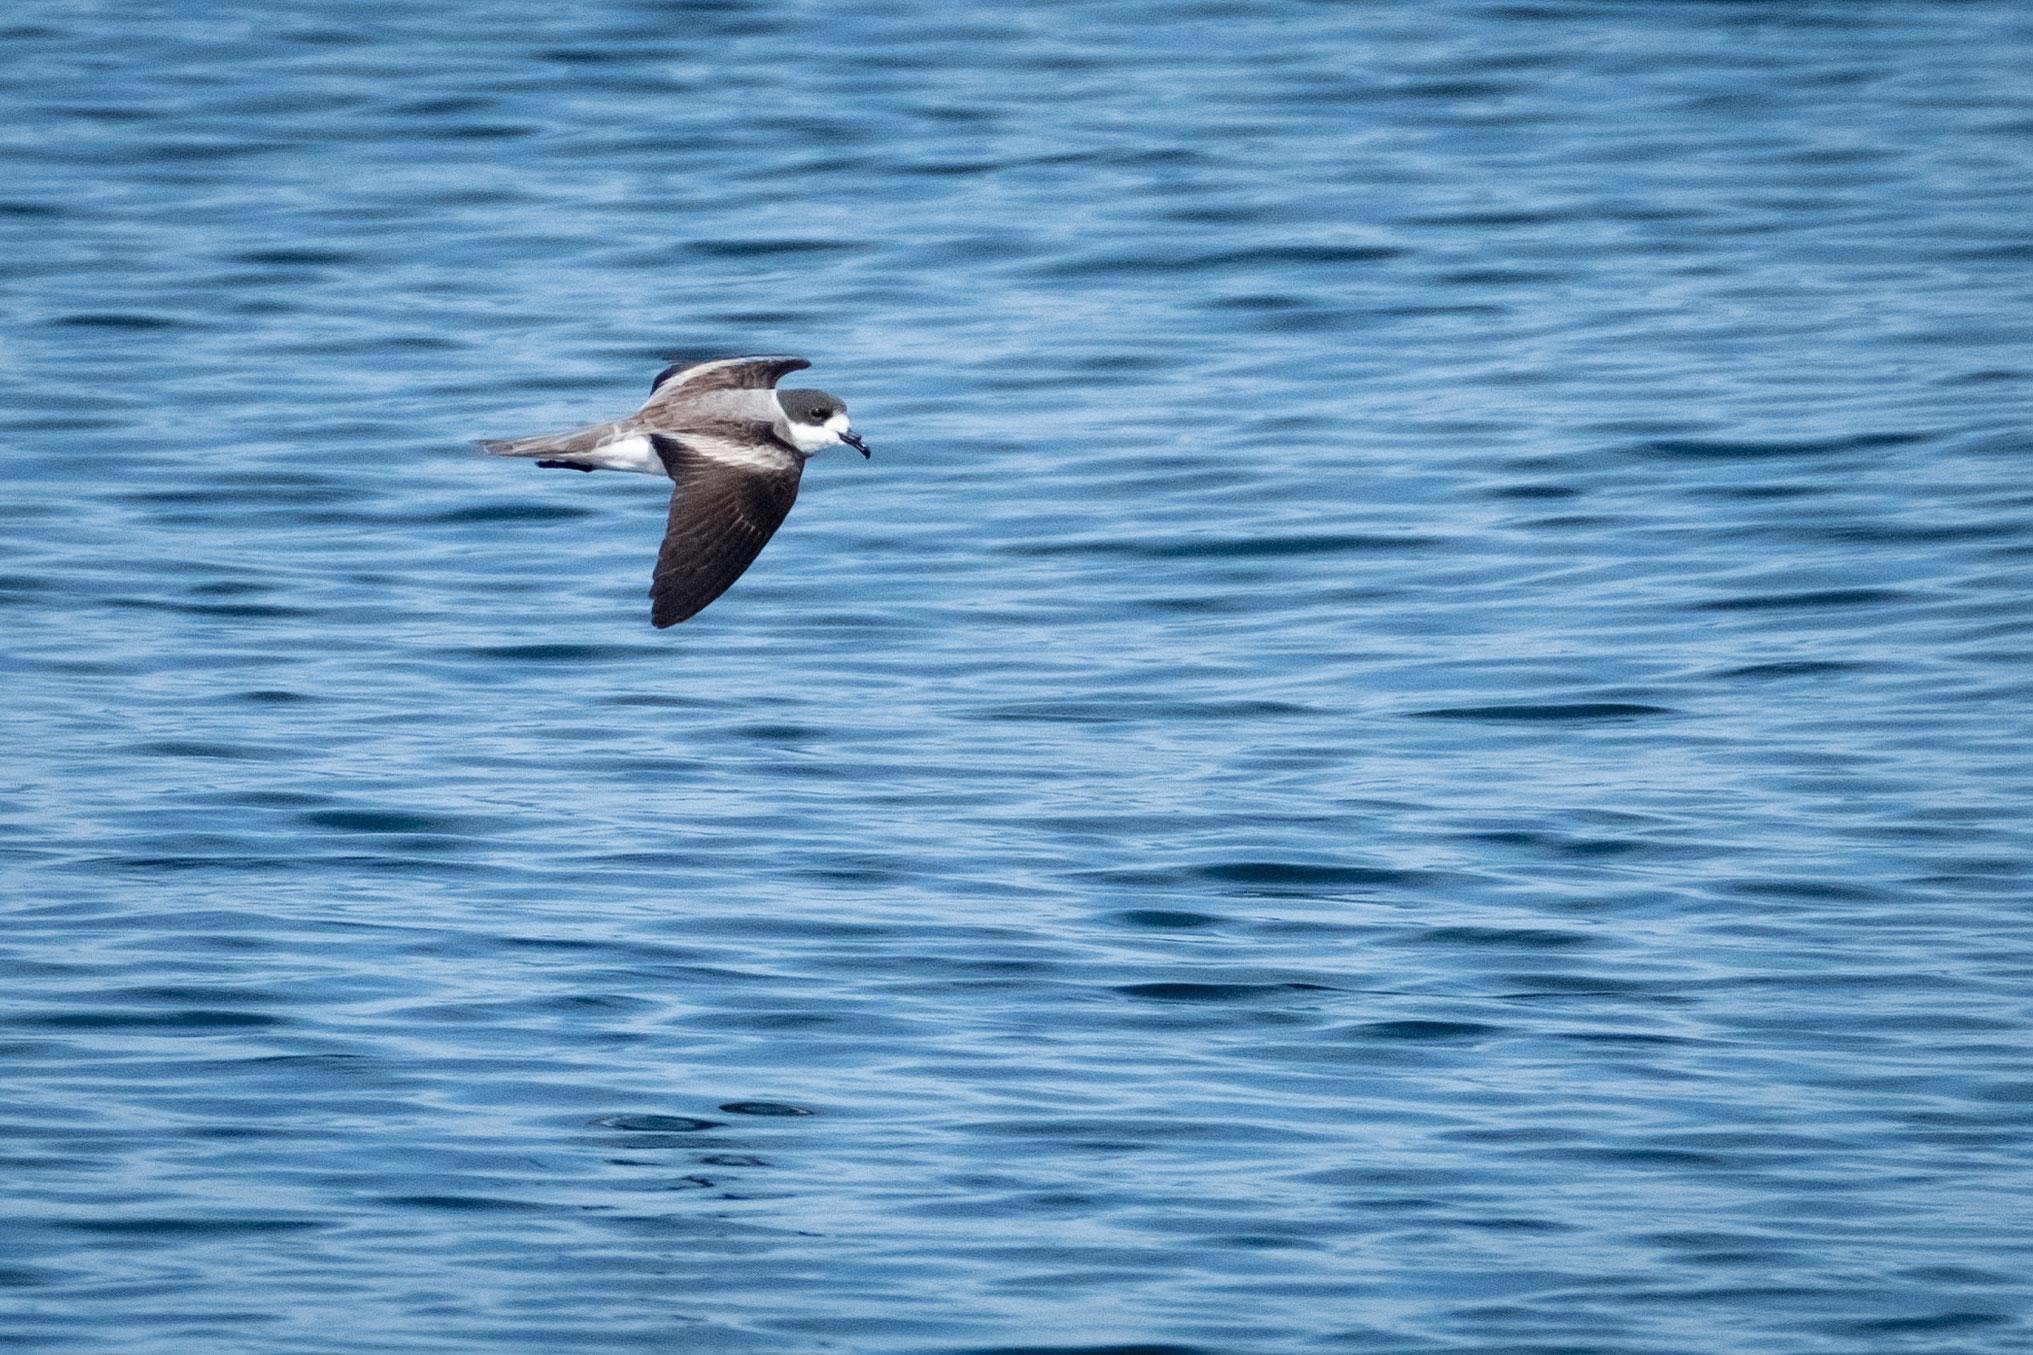 Hornby's Storm-Petrels forage along the South American coast year-round. Rodrigo Moraga